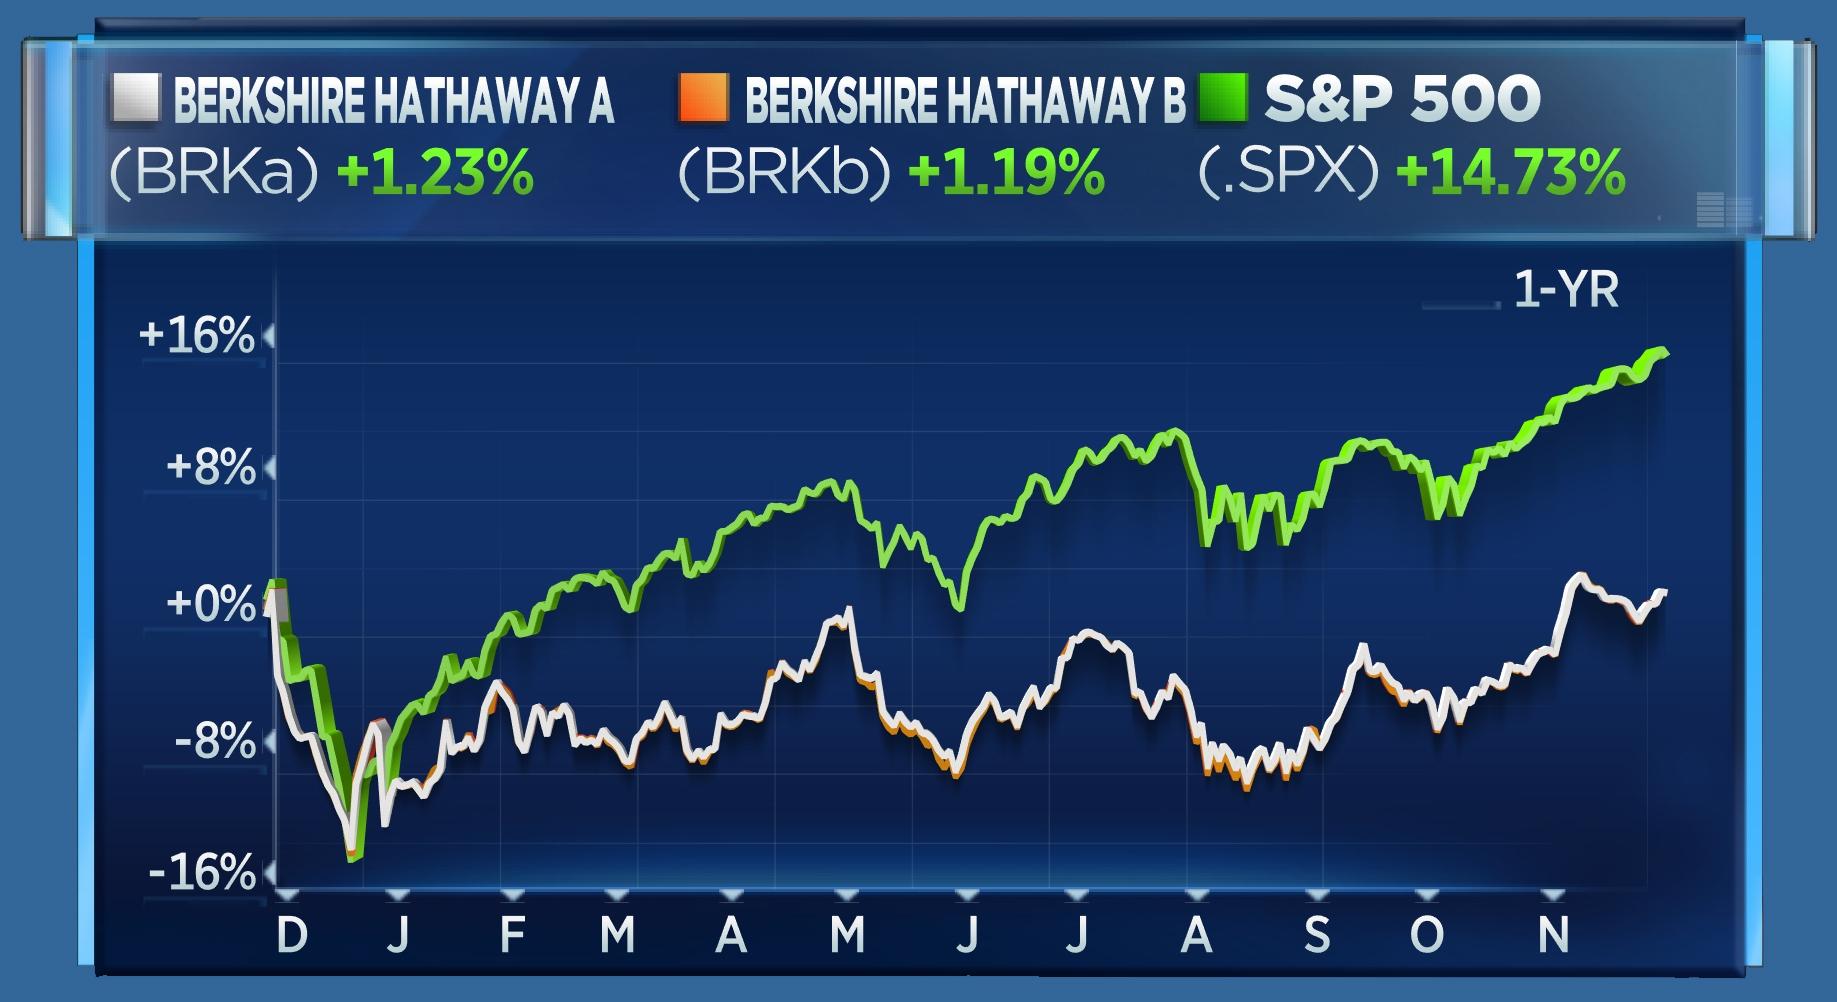 BRK.A vs BRK.B vs S&P